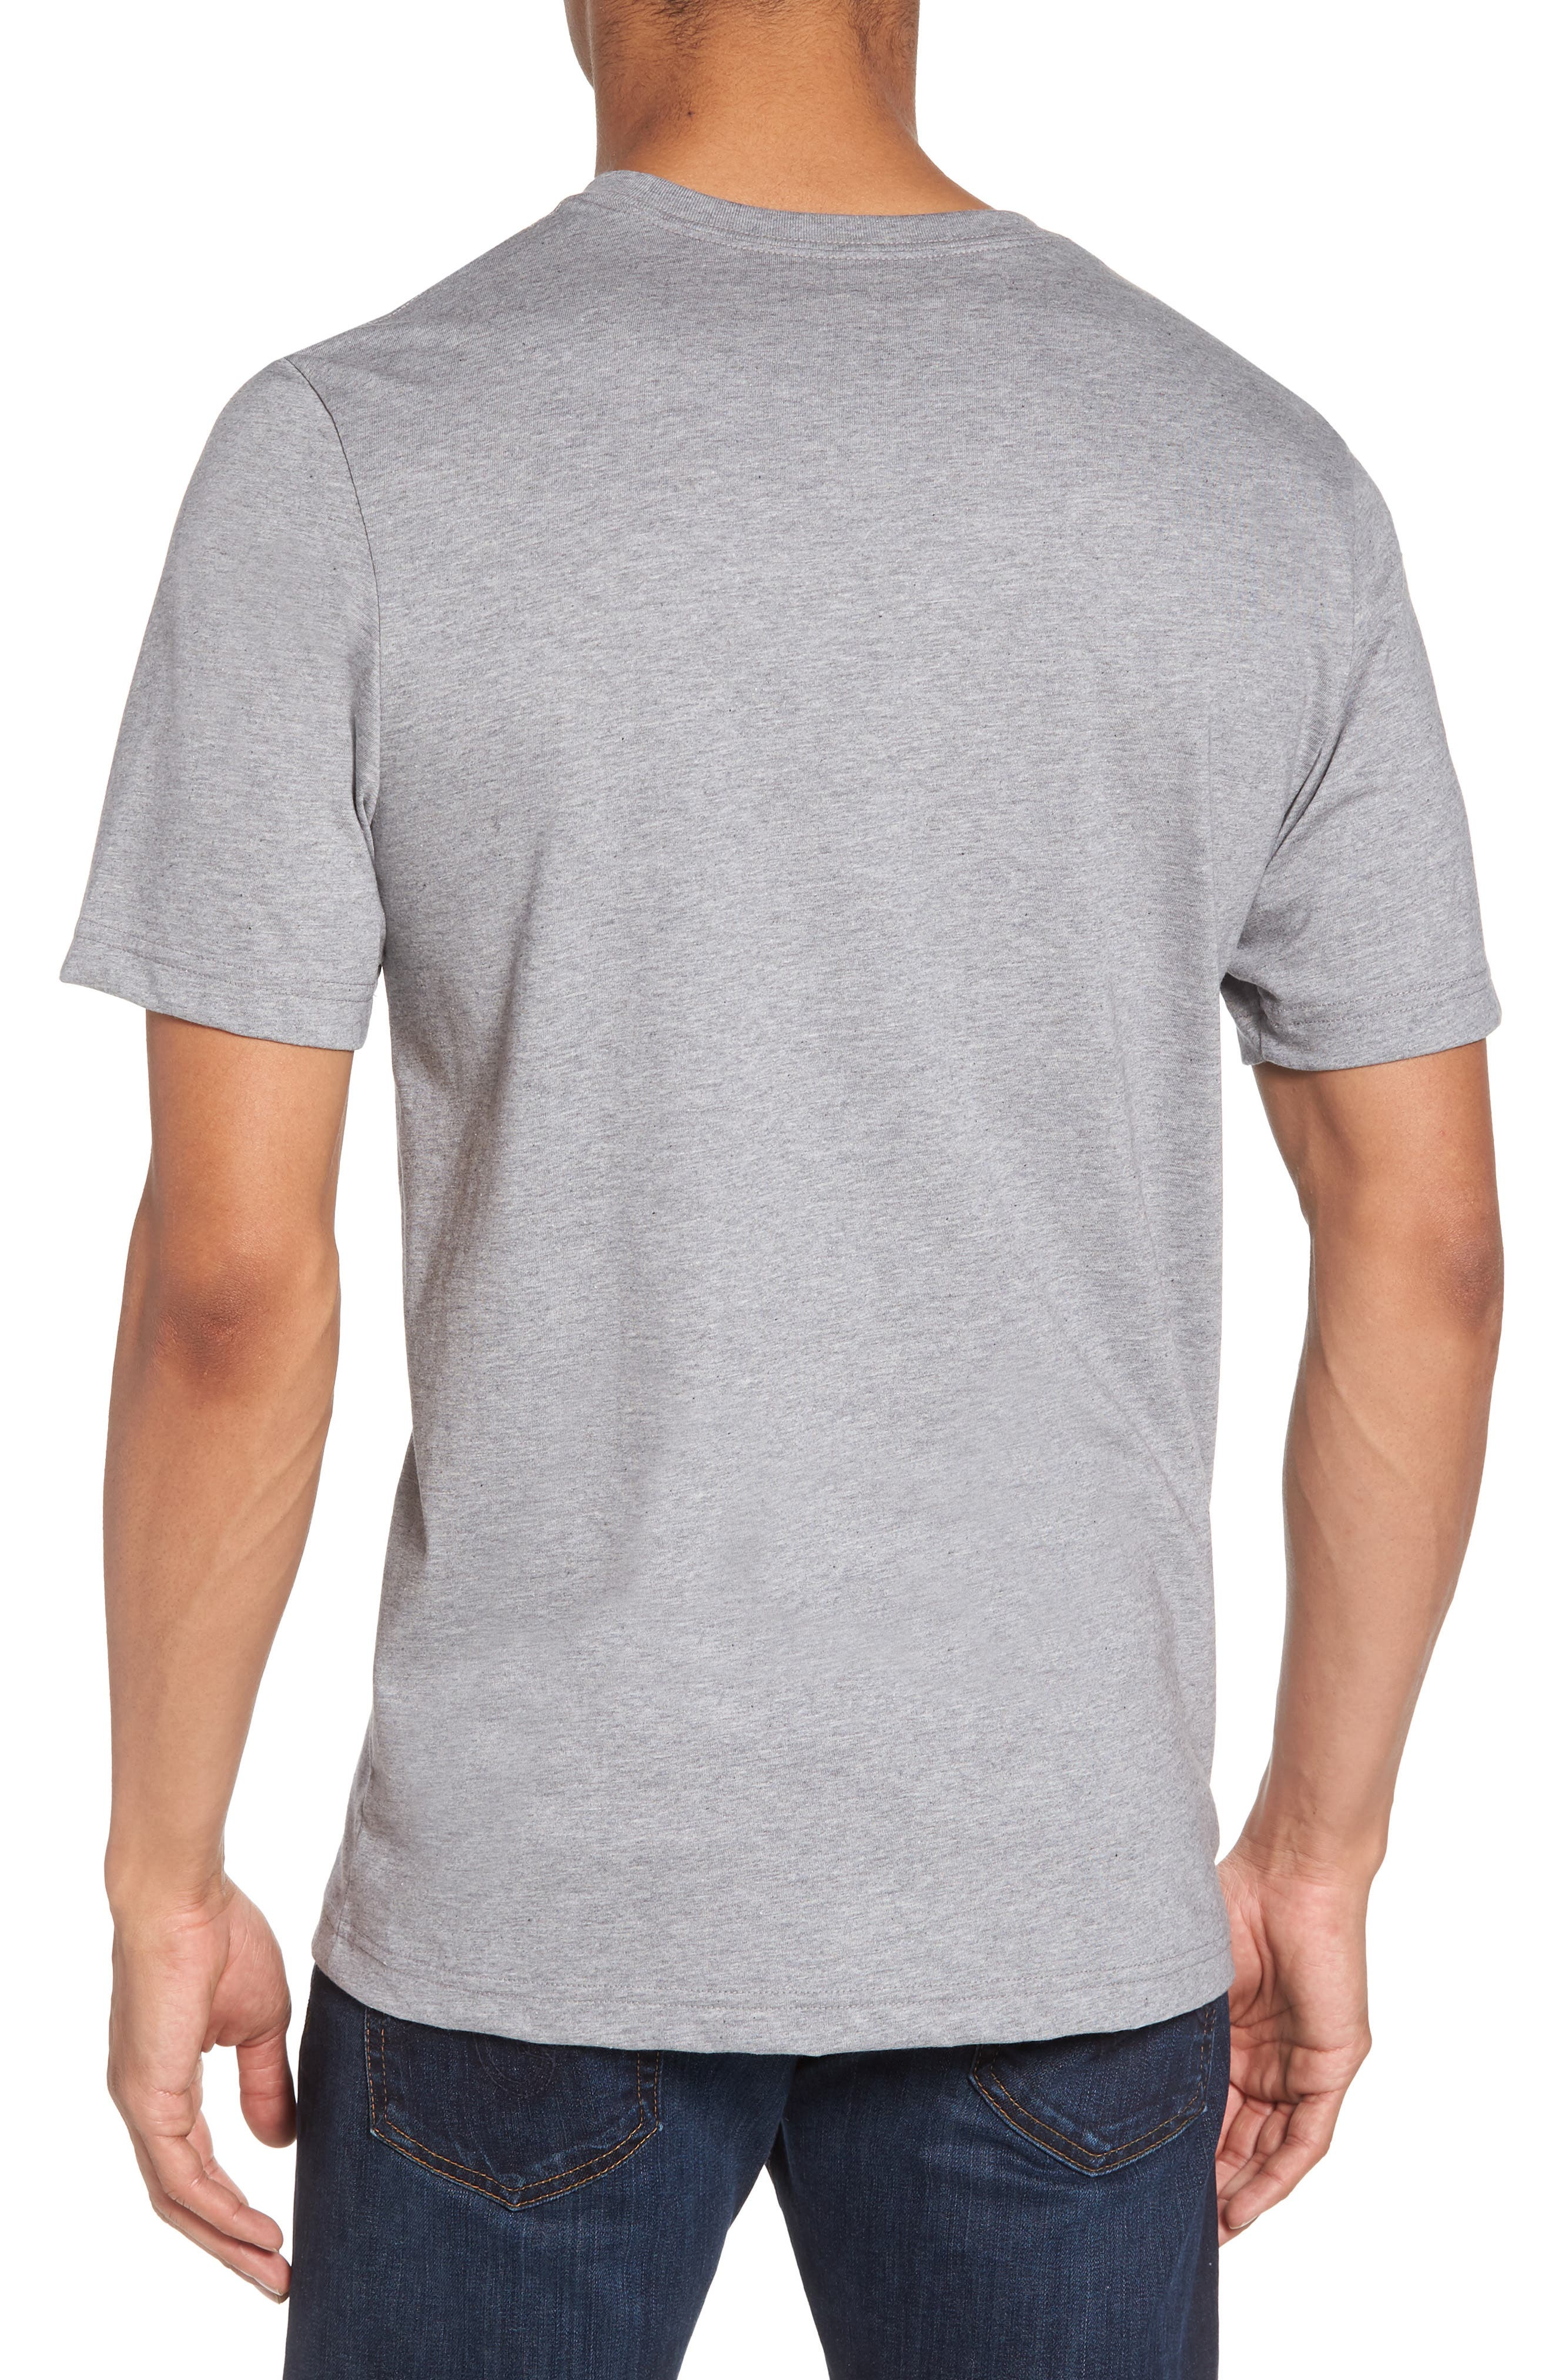 Bogue Pocket T-Shirt,                             Alternate thumbnail 2, color,                             020